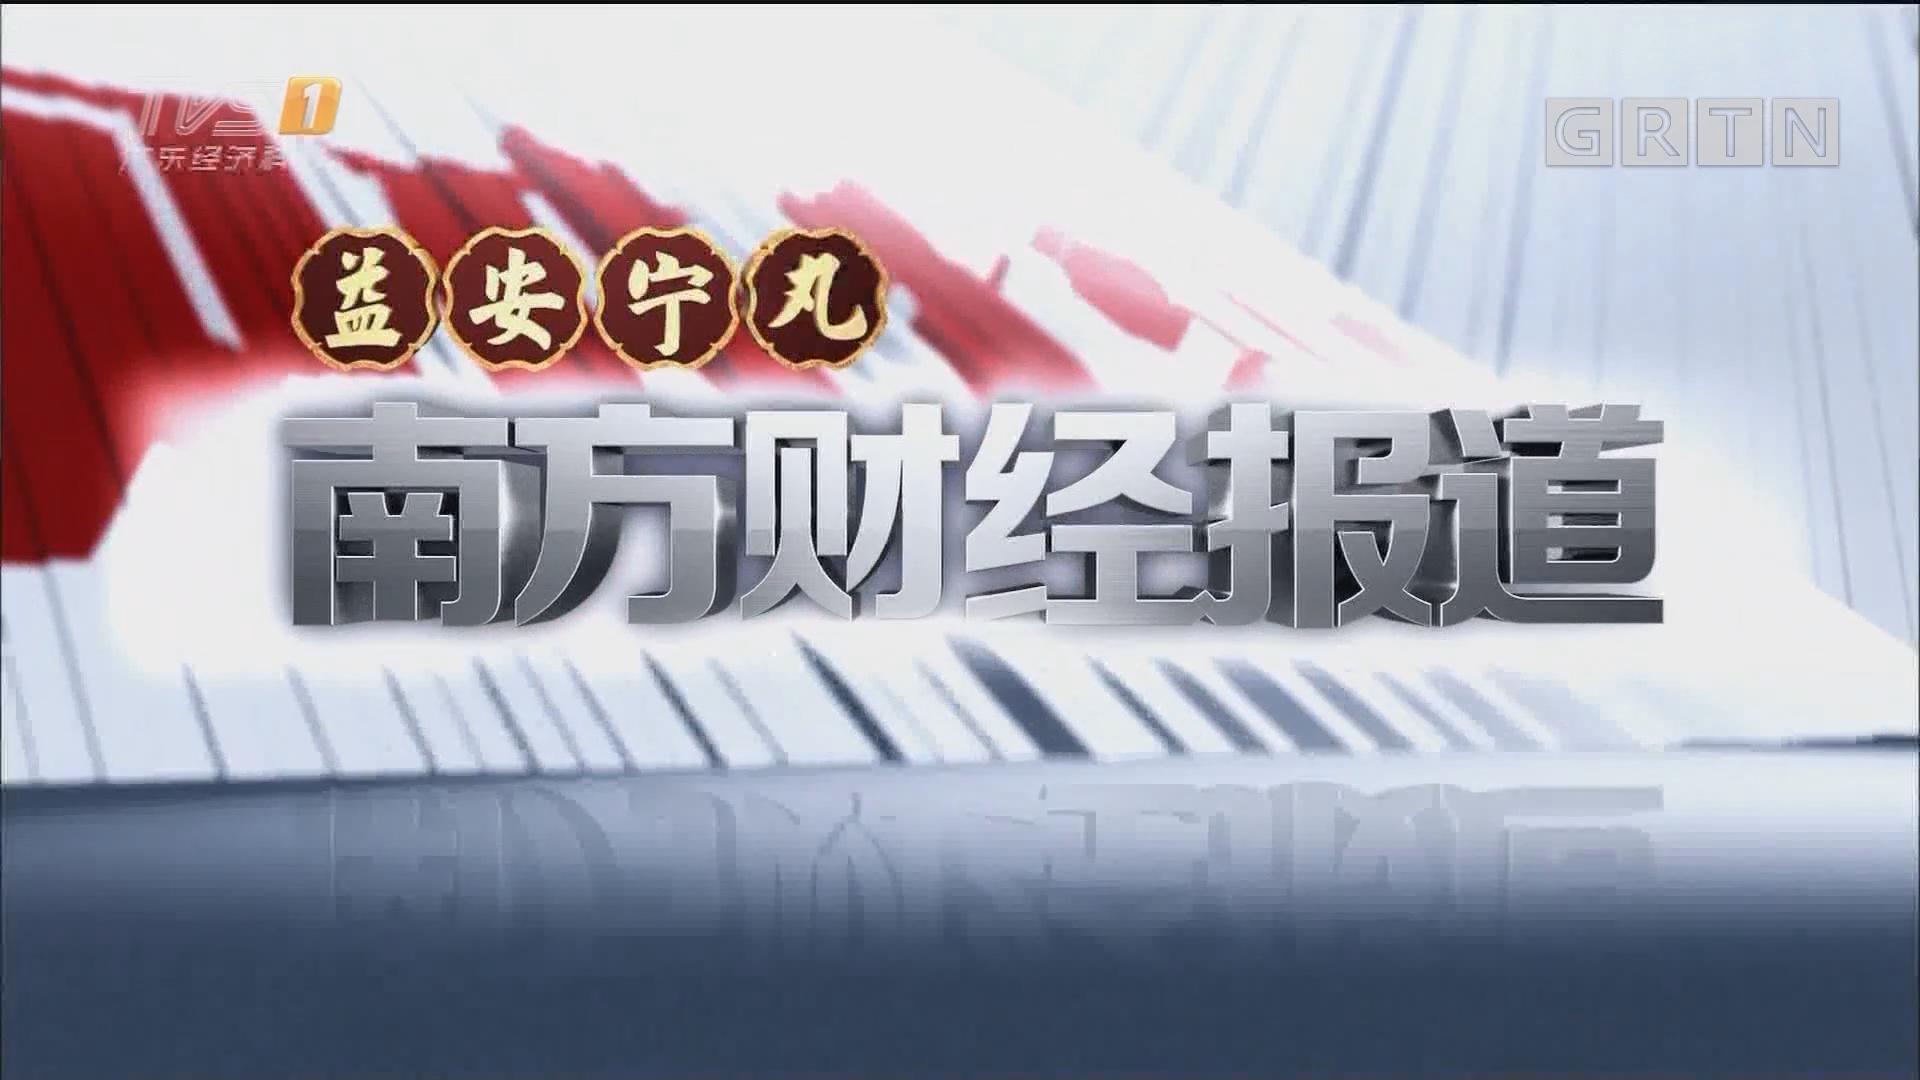 [HD][2019-05-20]南方财经报道:首届粤港澳大湾区媒体峰会:搭建大湾区媒体合作平台